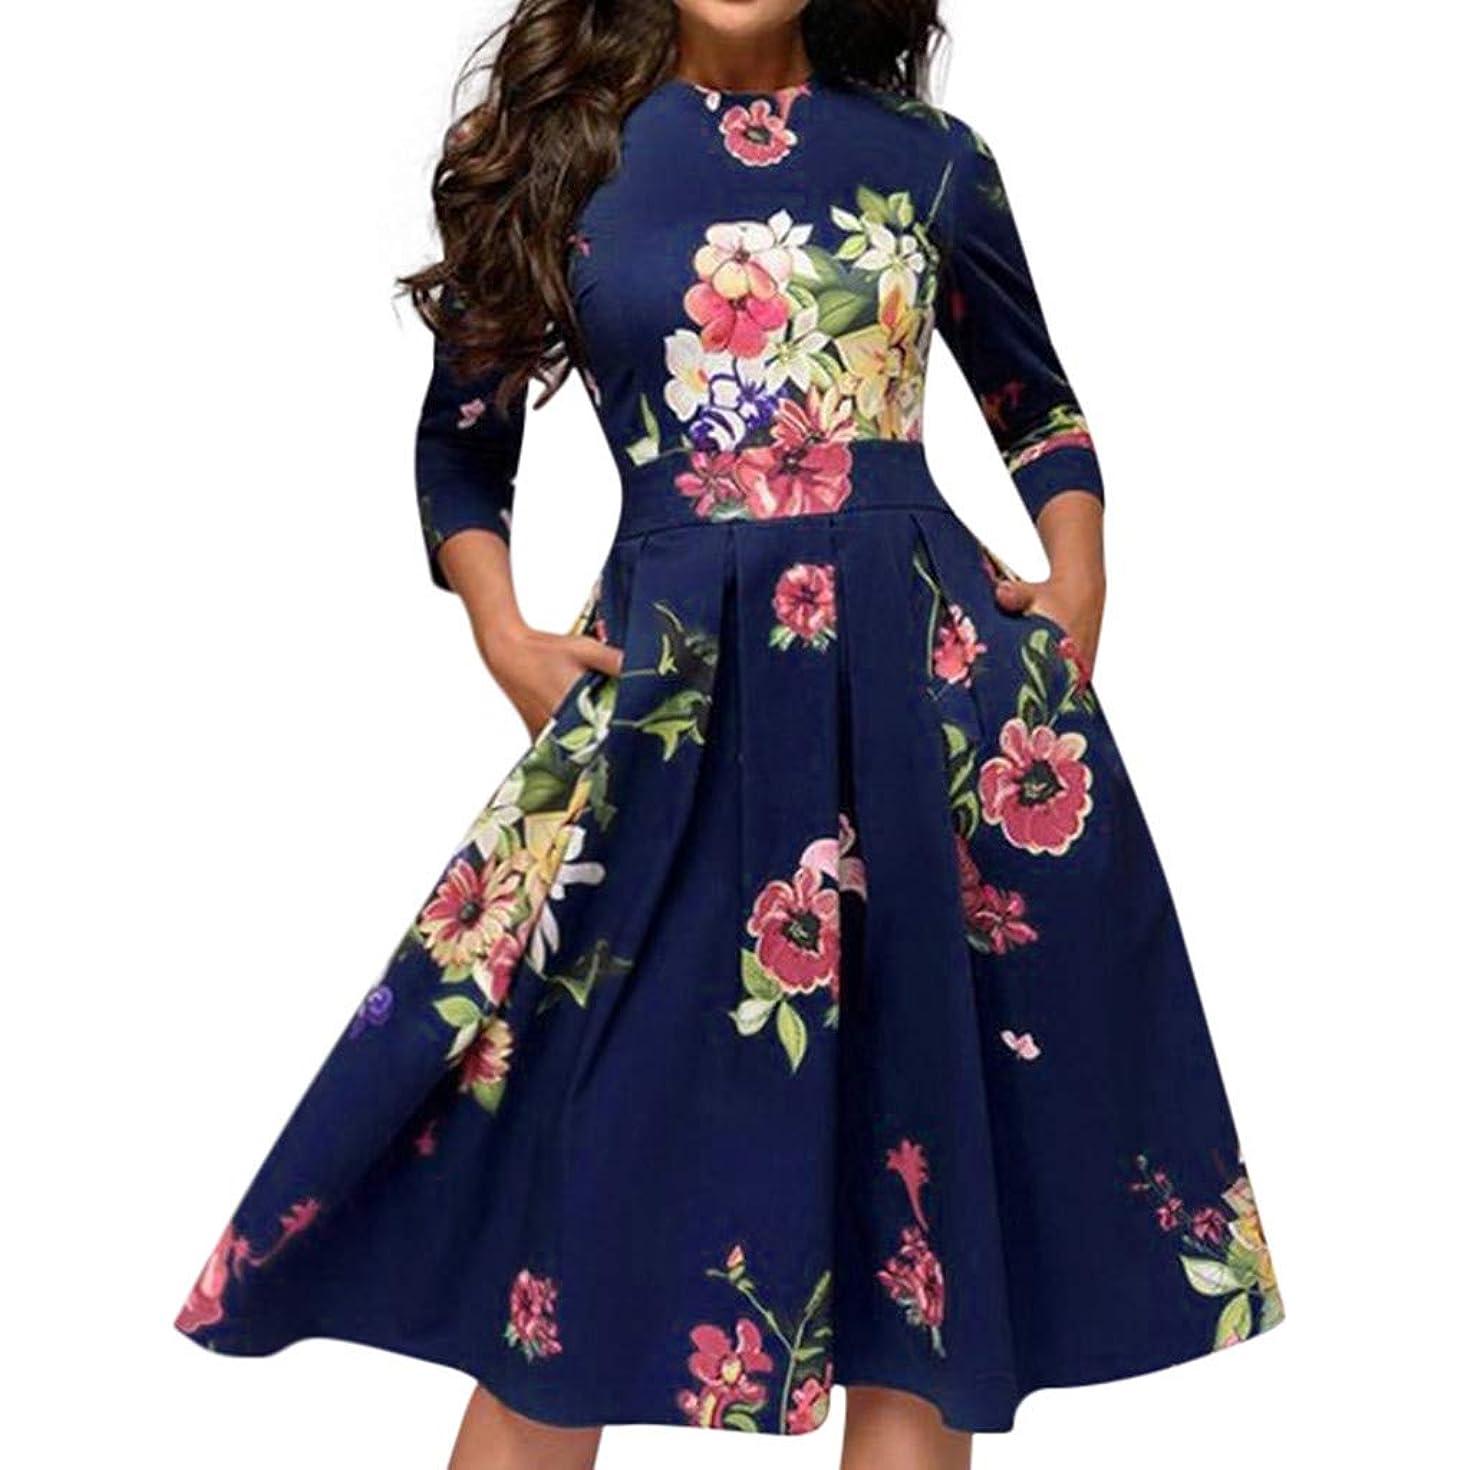 Peacur Women 3/4 Sleeve Dresses Elegent Vintage A-line Floral Print Party Work Midi Dress